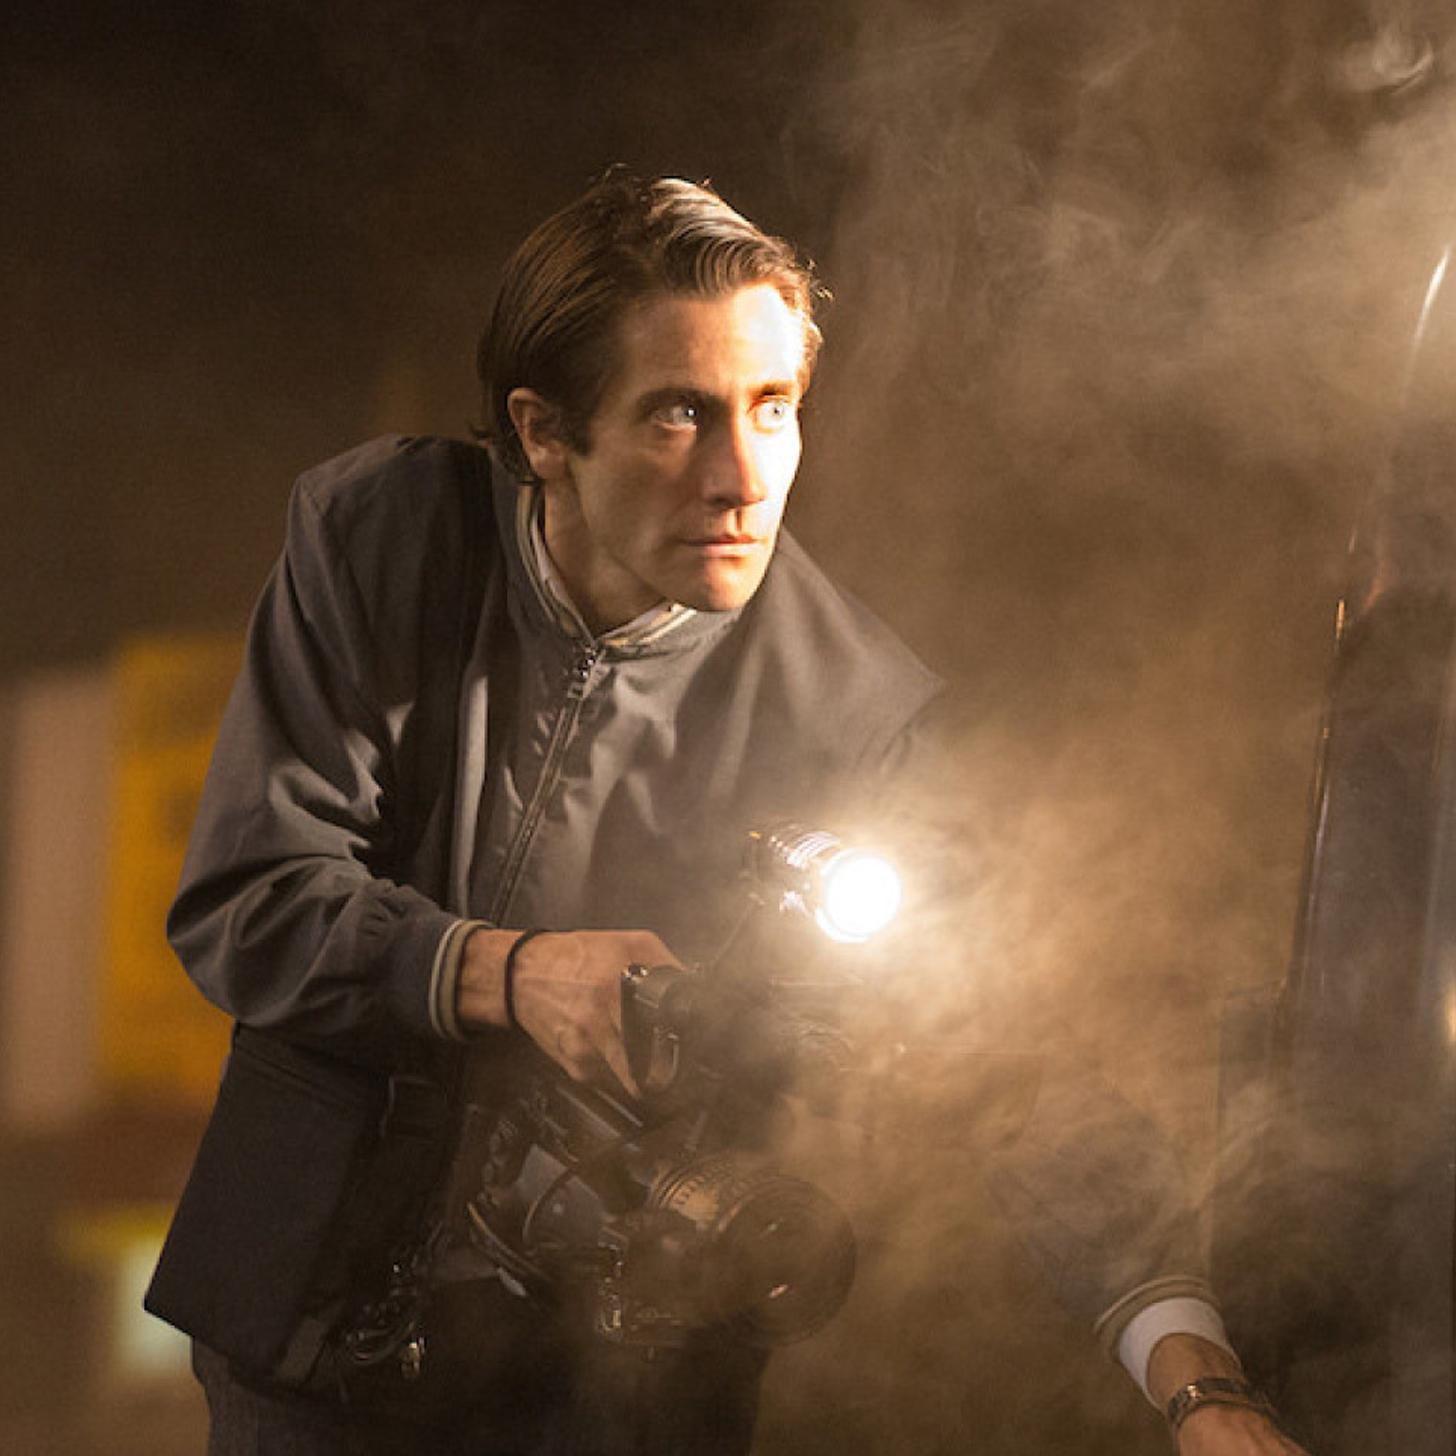 Jake Gyllenhaal Nightcrawler Movie   POPSUGAR Entertainment